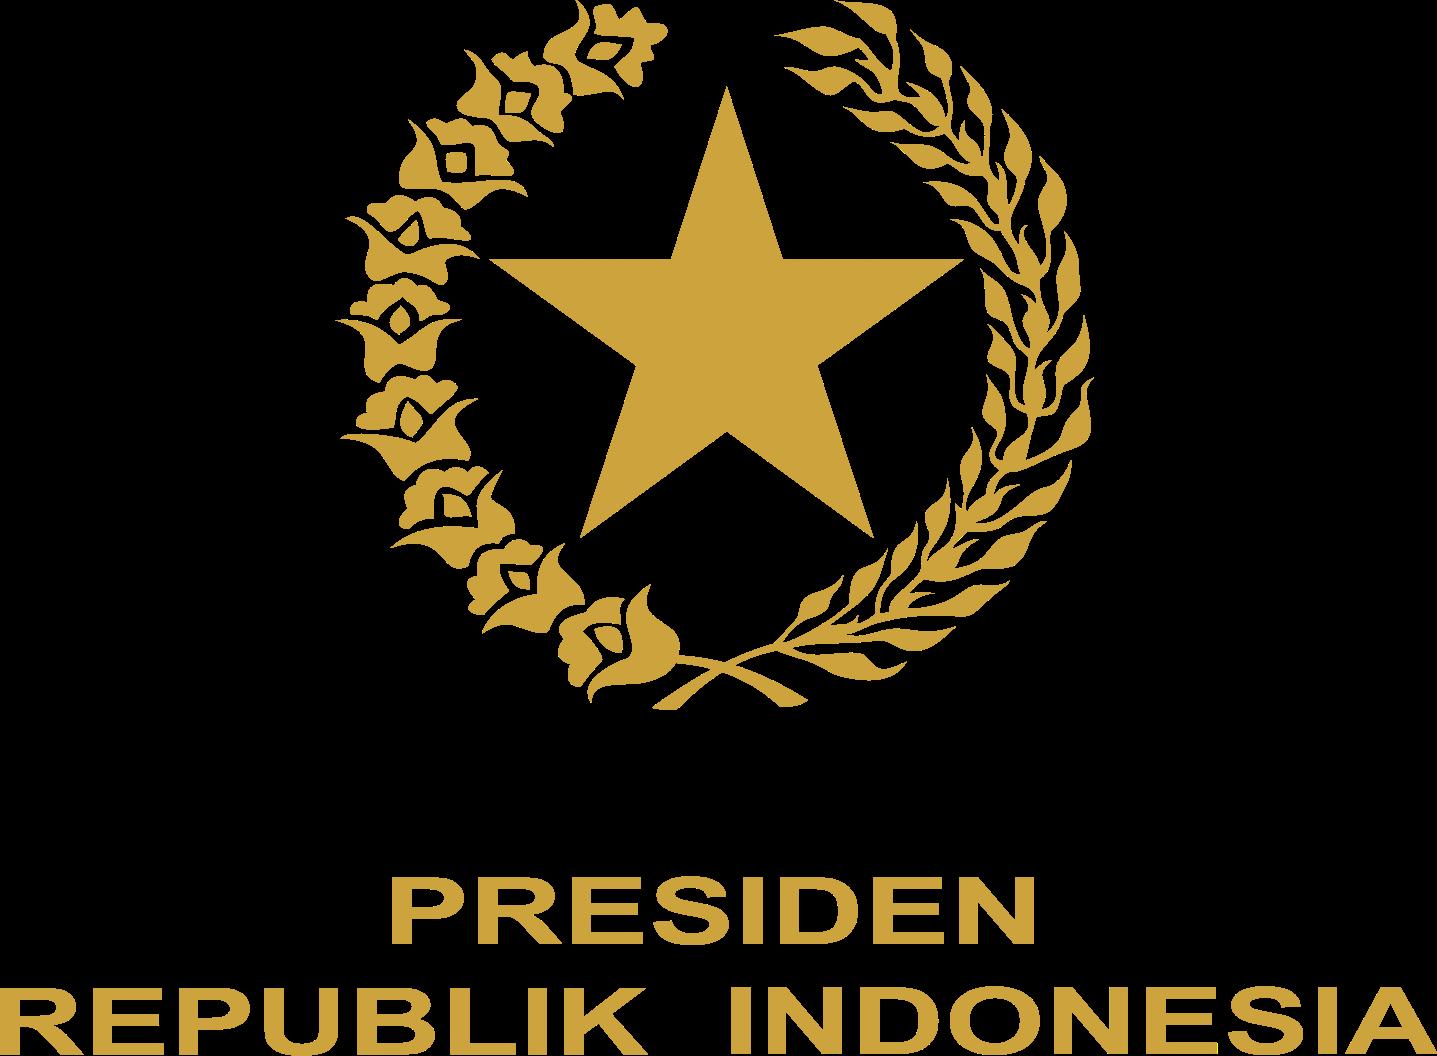 logo resmi presiden republik indonesia ri free format